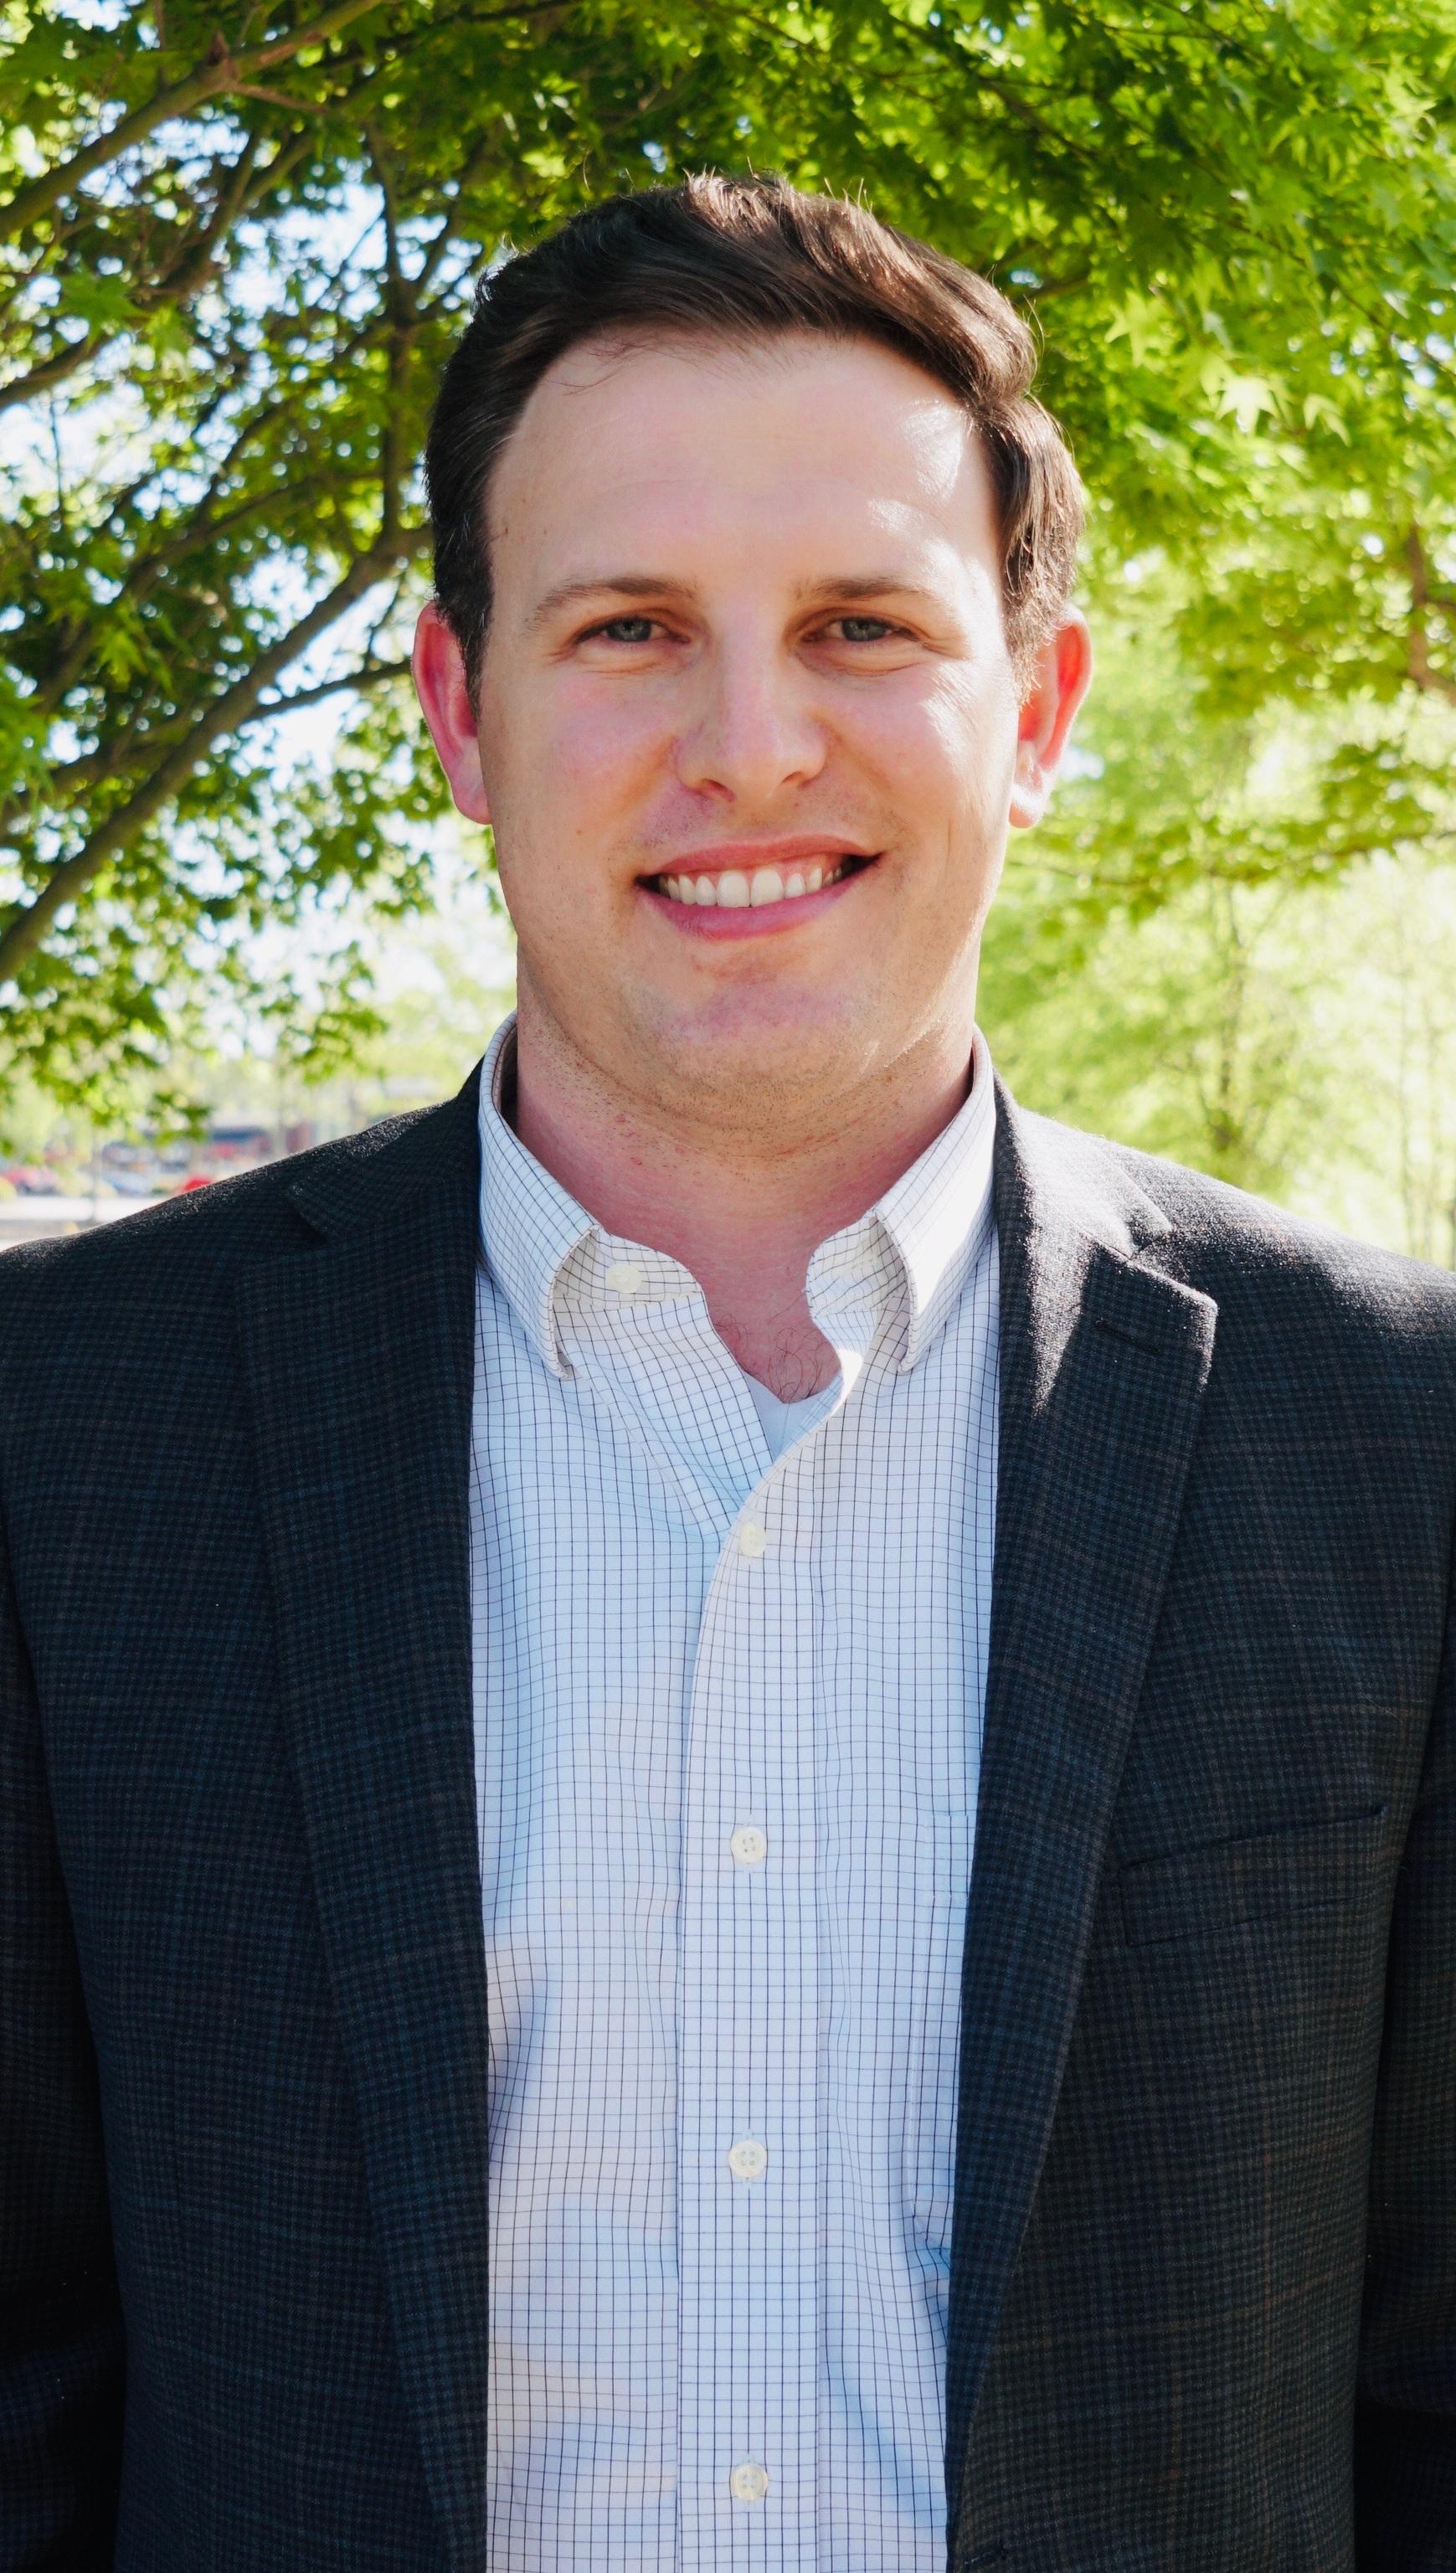 Kyle Parker | Board Member   - Husband, father, son - Advisor - Steward